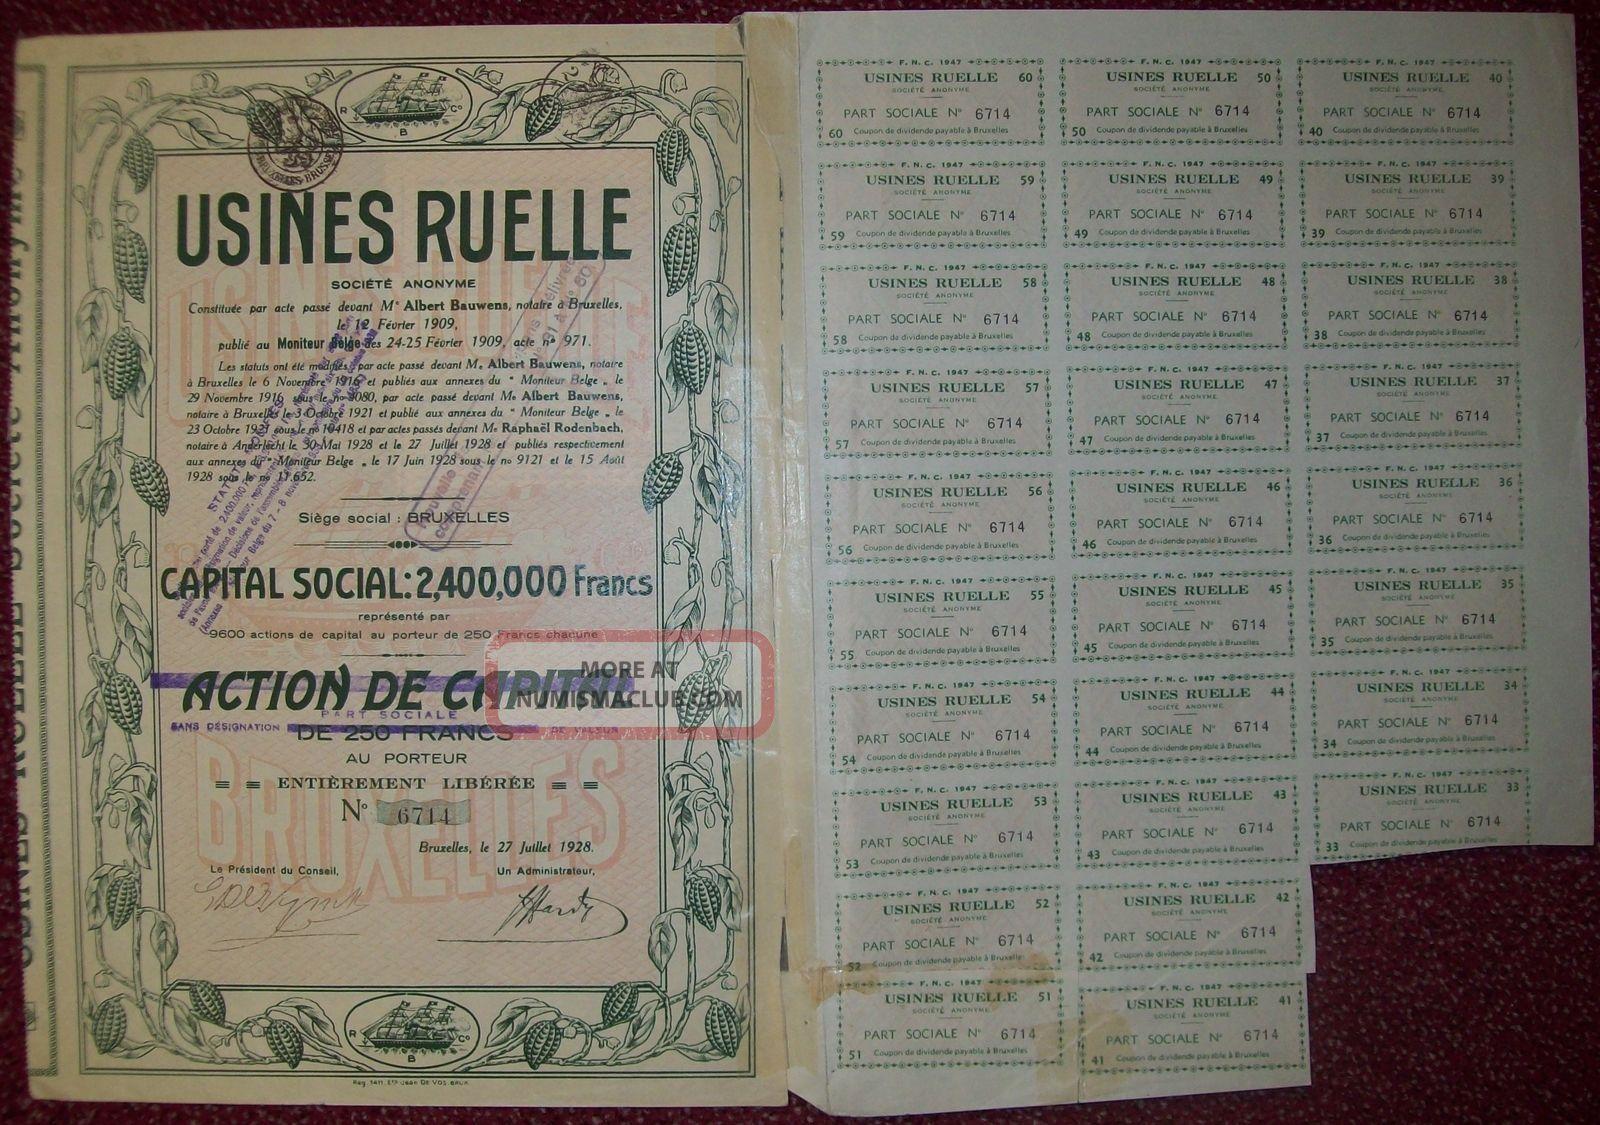 Belgium 1928 Bond - Usines Ruelle Chocolat - With Coupons. . .  R3375 World photo